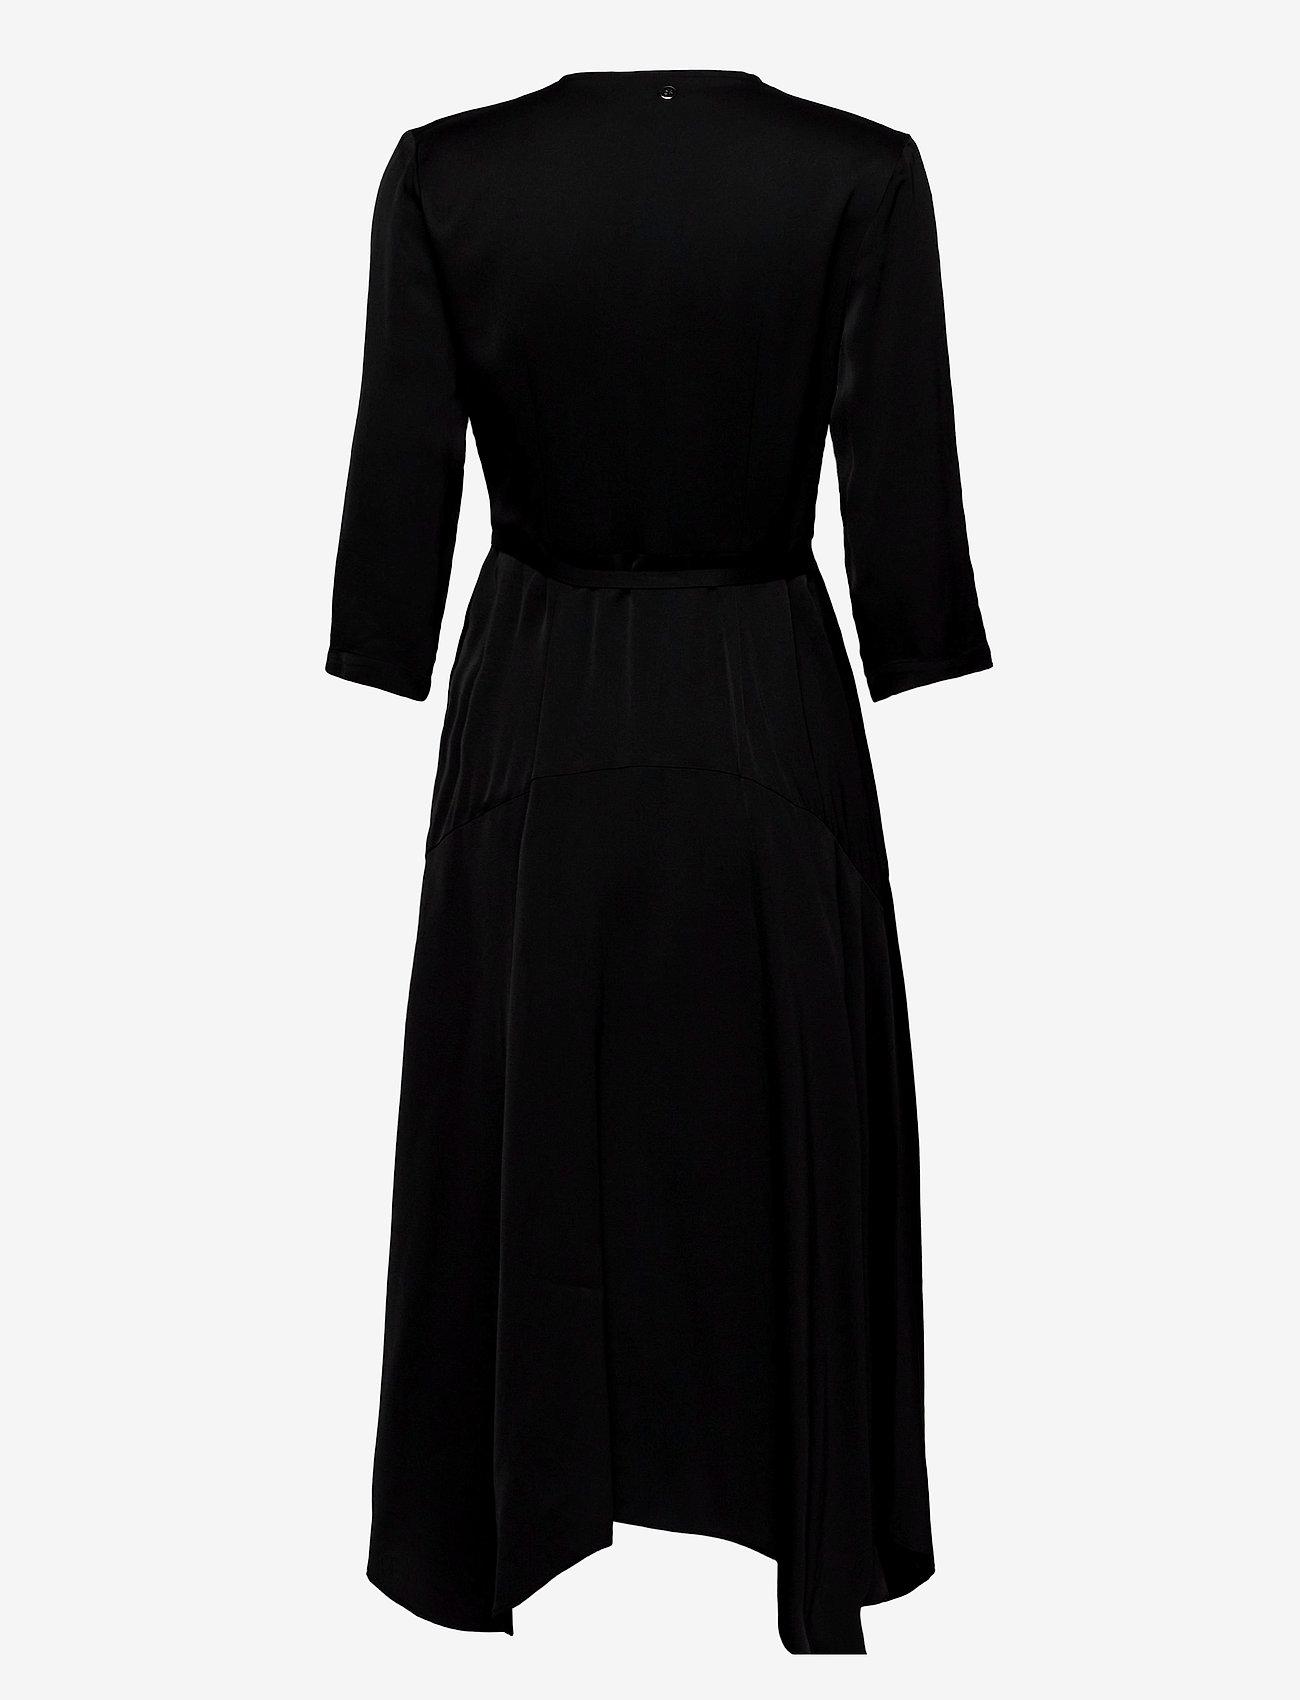 3/4 Slv Wrap Dress (Zebra Black Patchwork) (2600 kr) - Calvin Klein